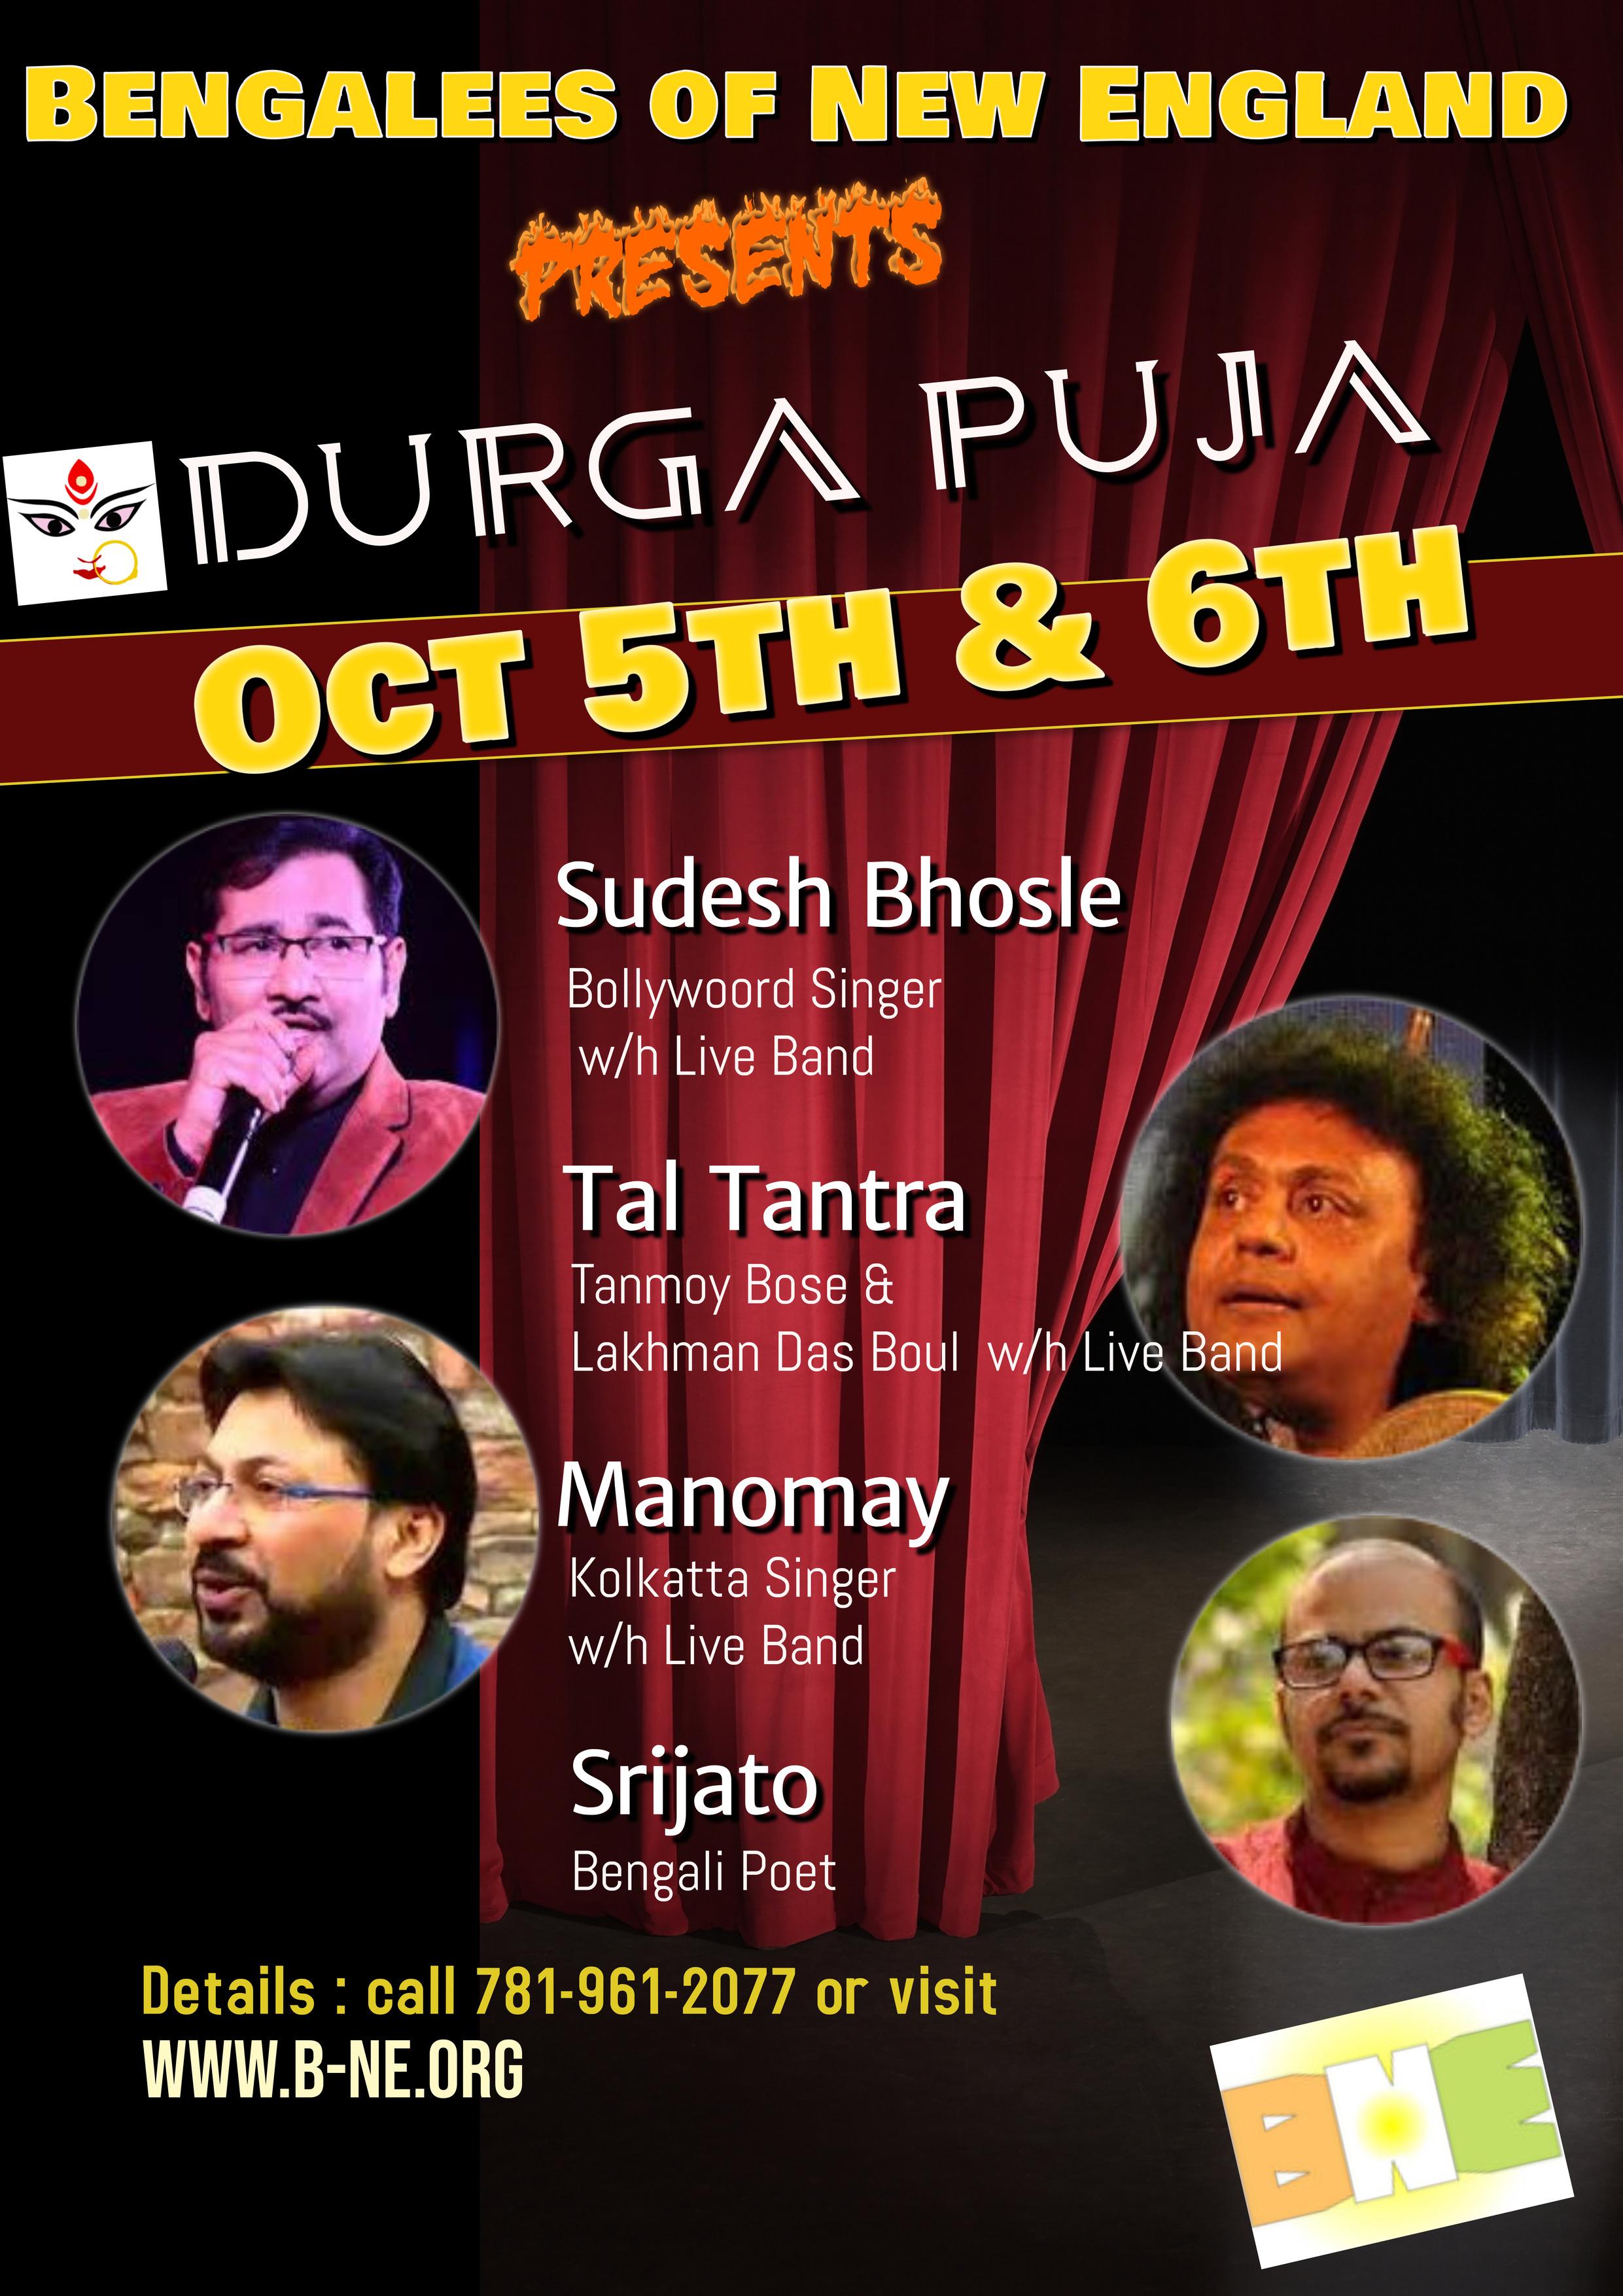 BNE-DurgaPuja-Poster.jpg